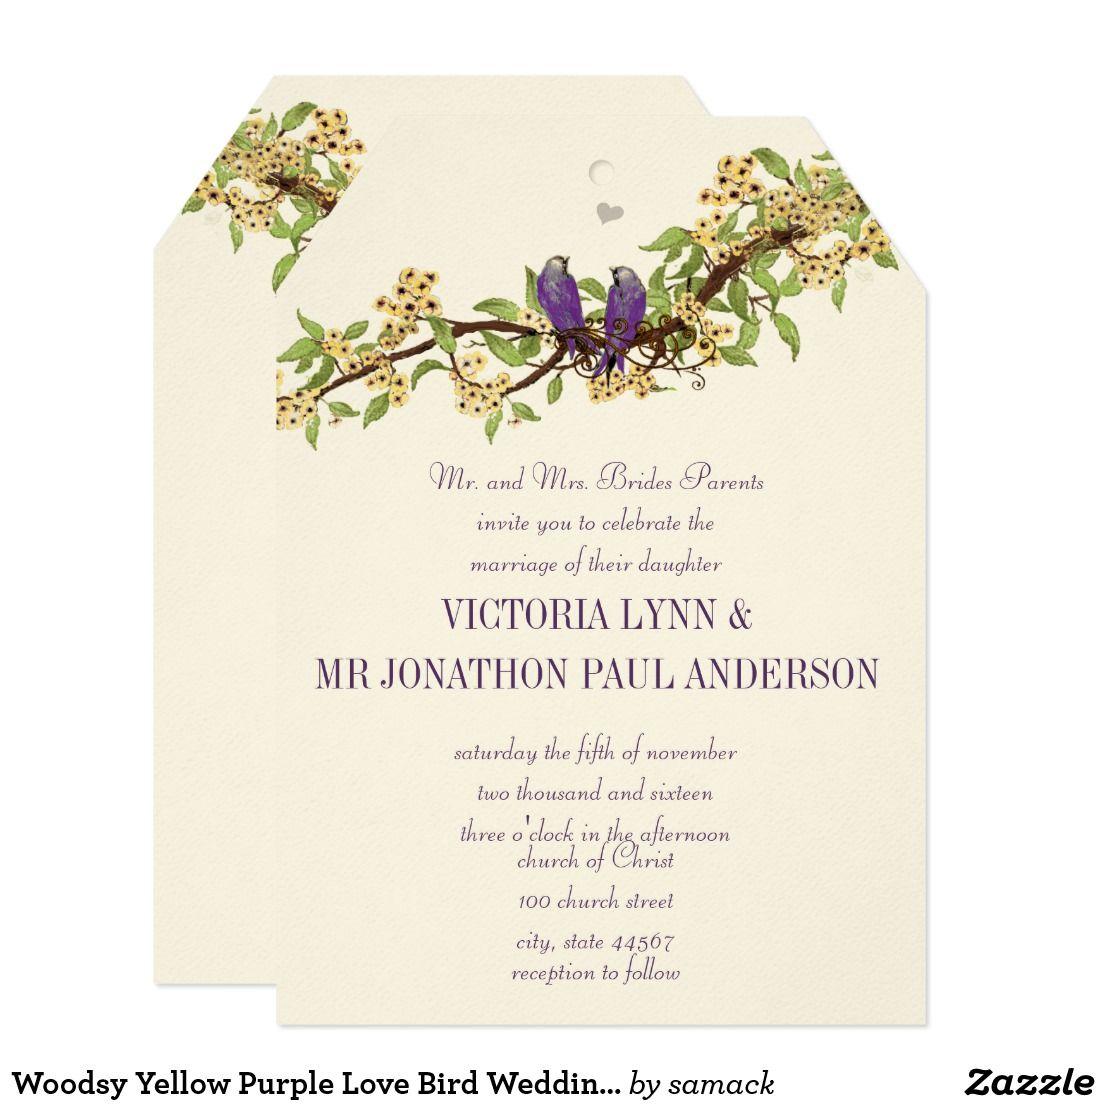 Woodsy Yellow Purple Love Bird Wedding Invitations | Invites wedding ...